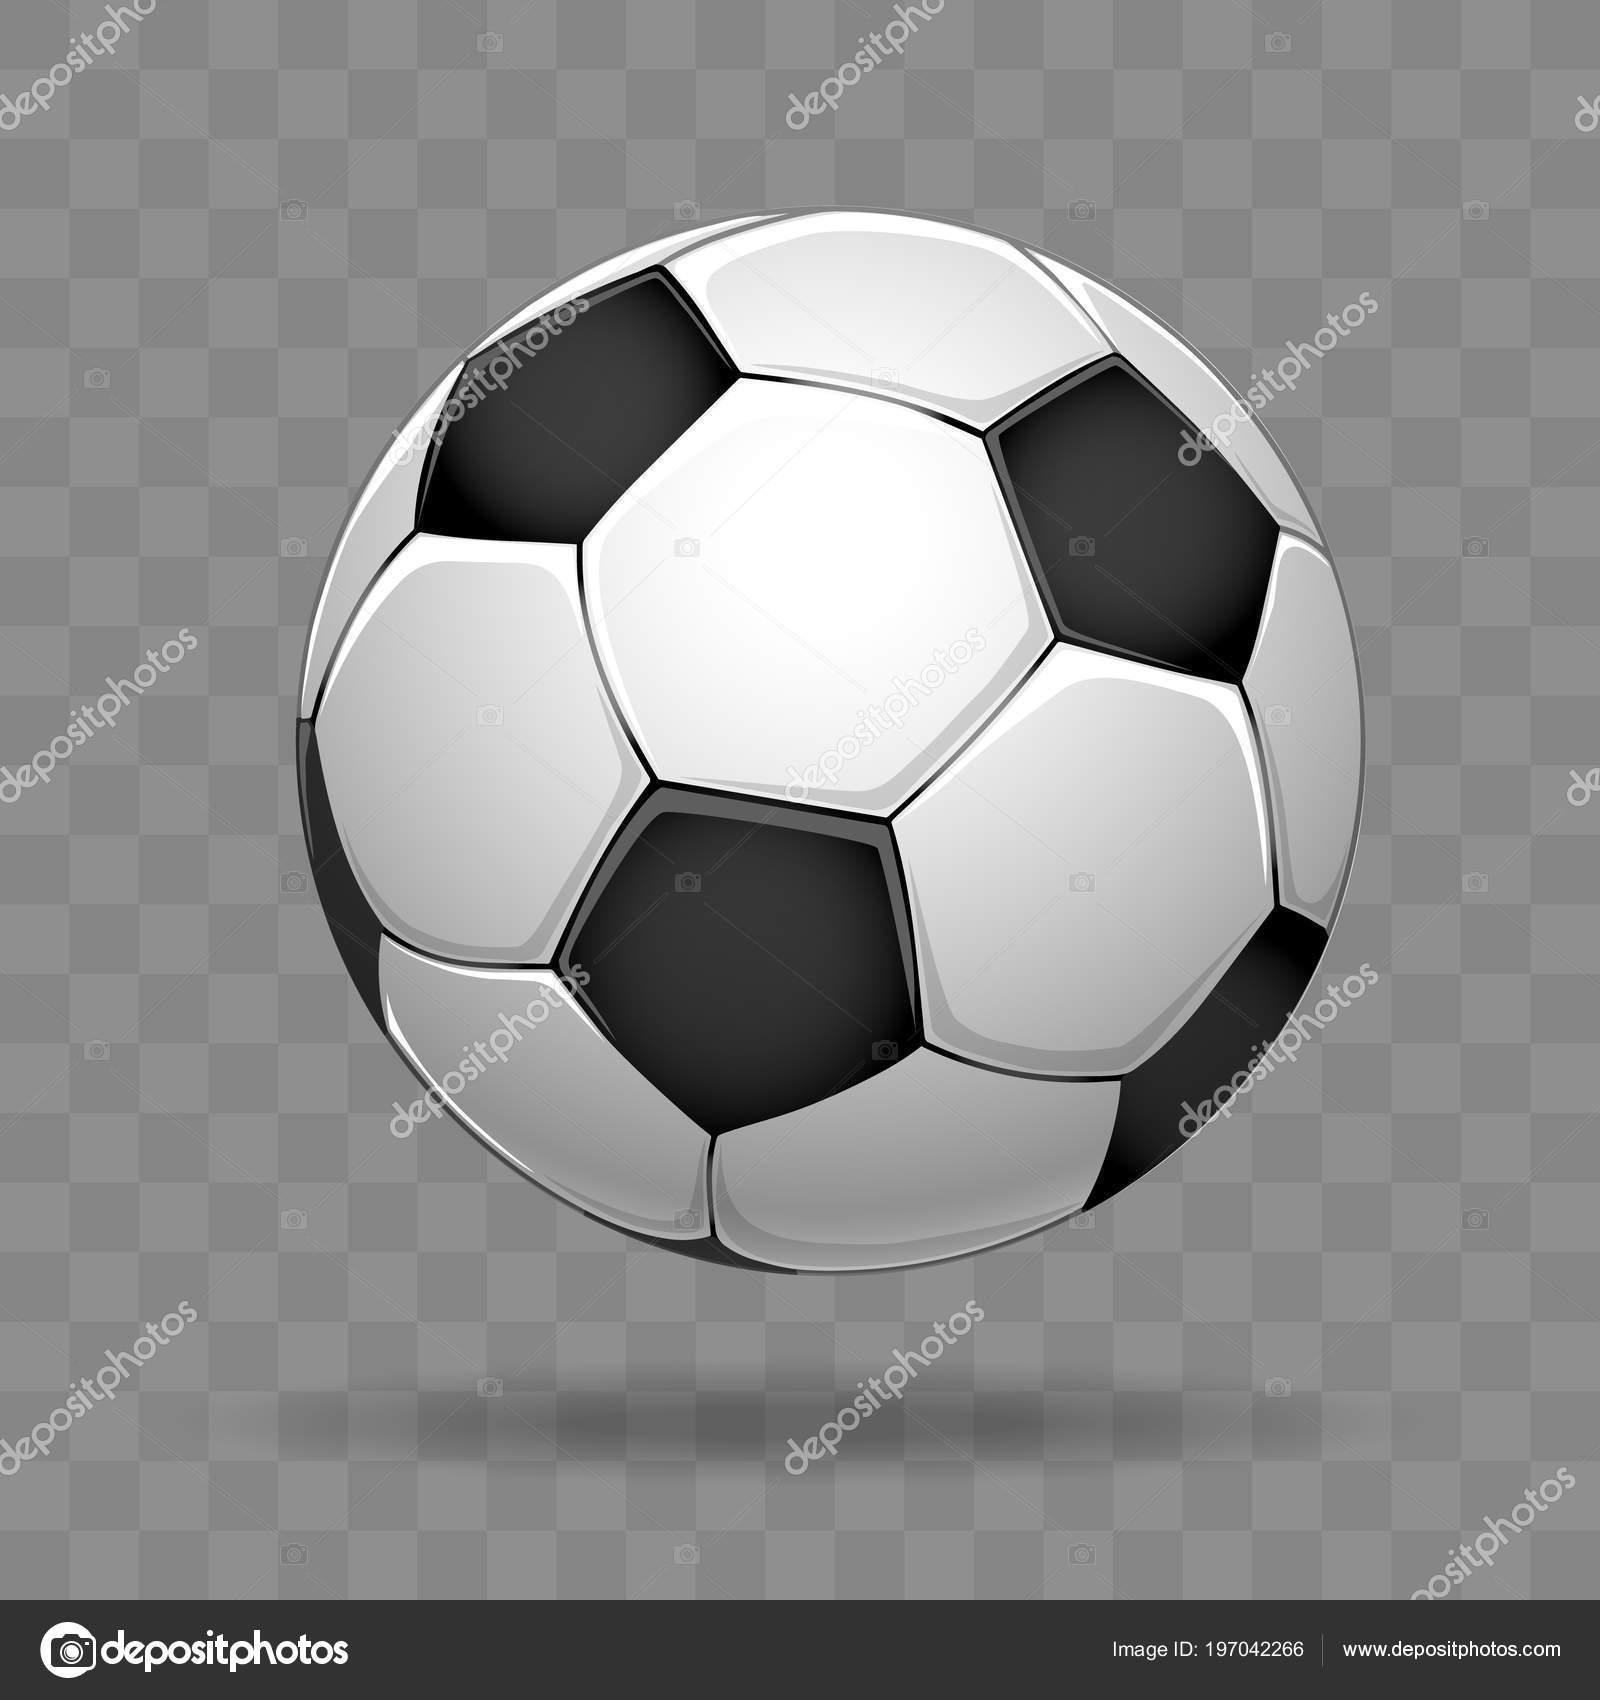 Soccer Ball Transparent Soccer Ball Isolated On Transparent Background Stock Vector C Vectortatu 197042266